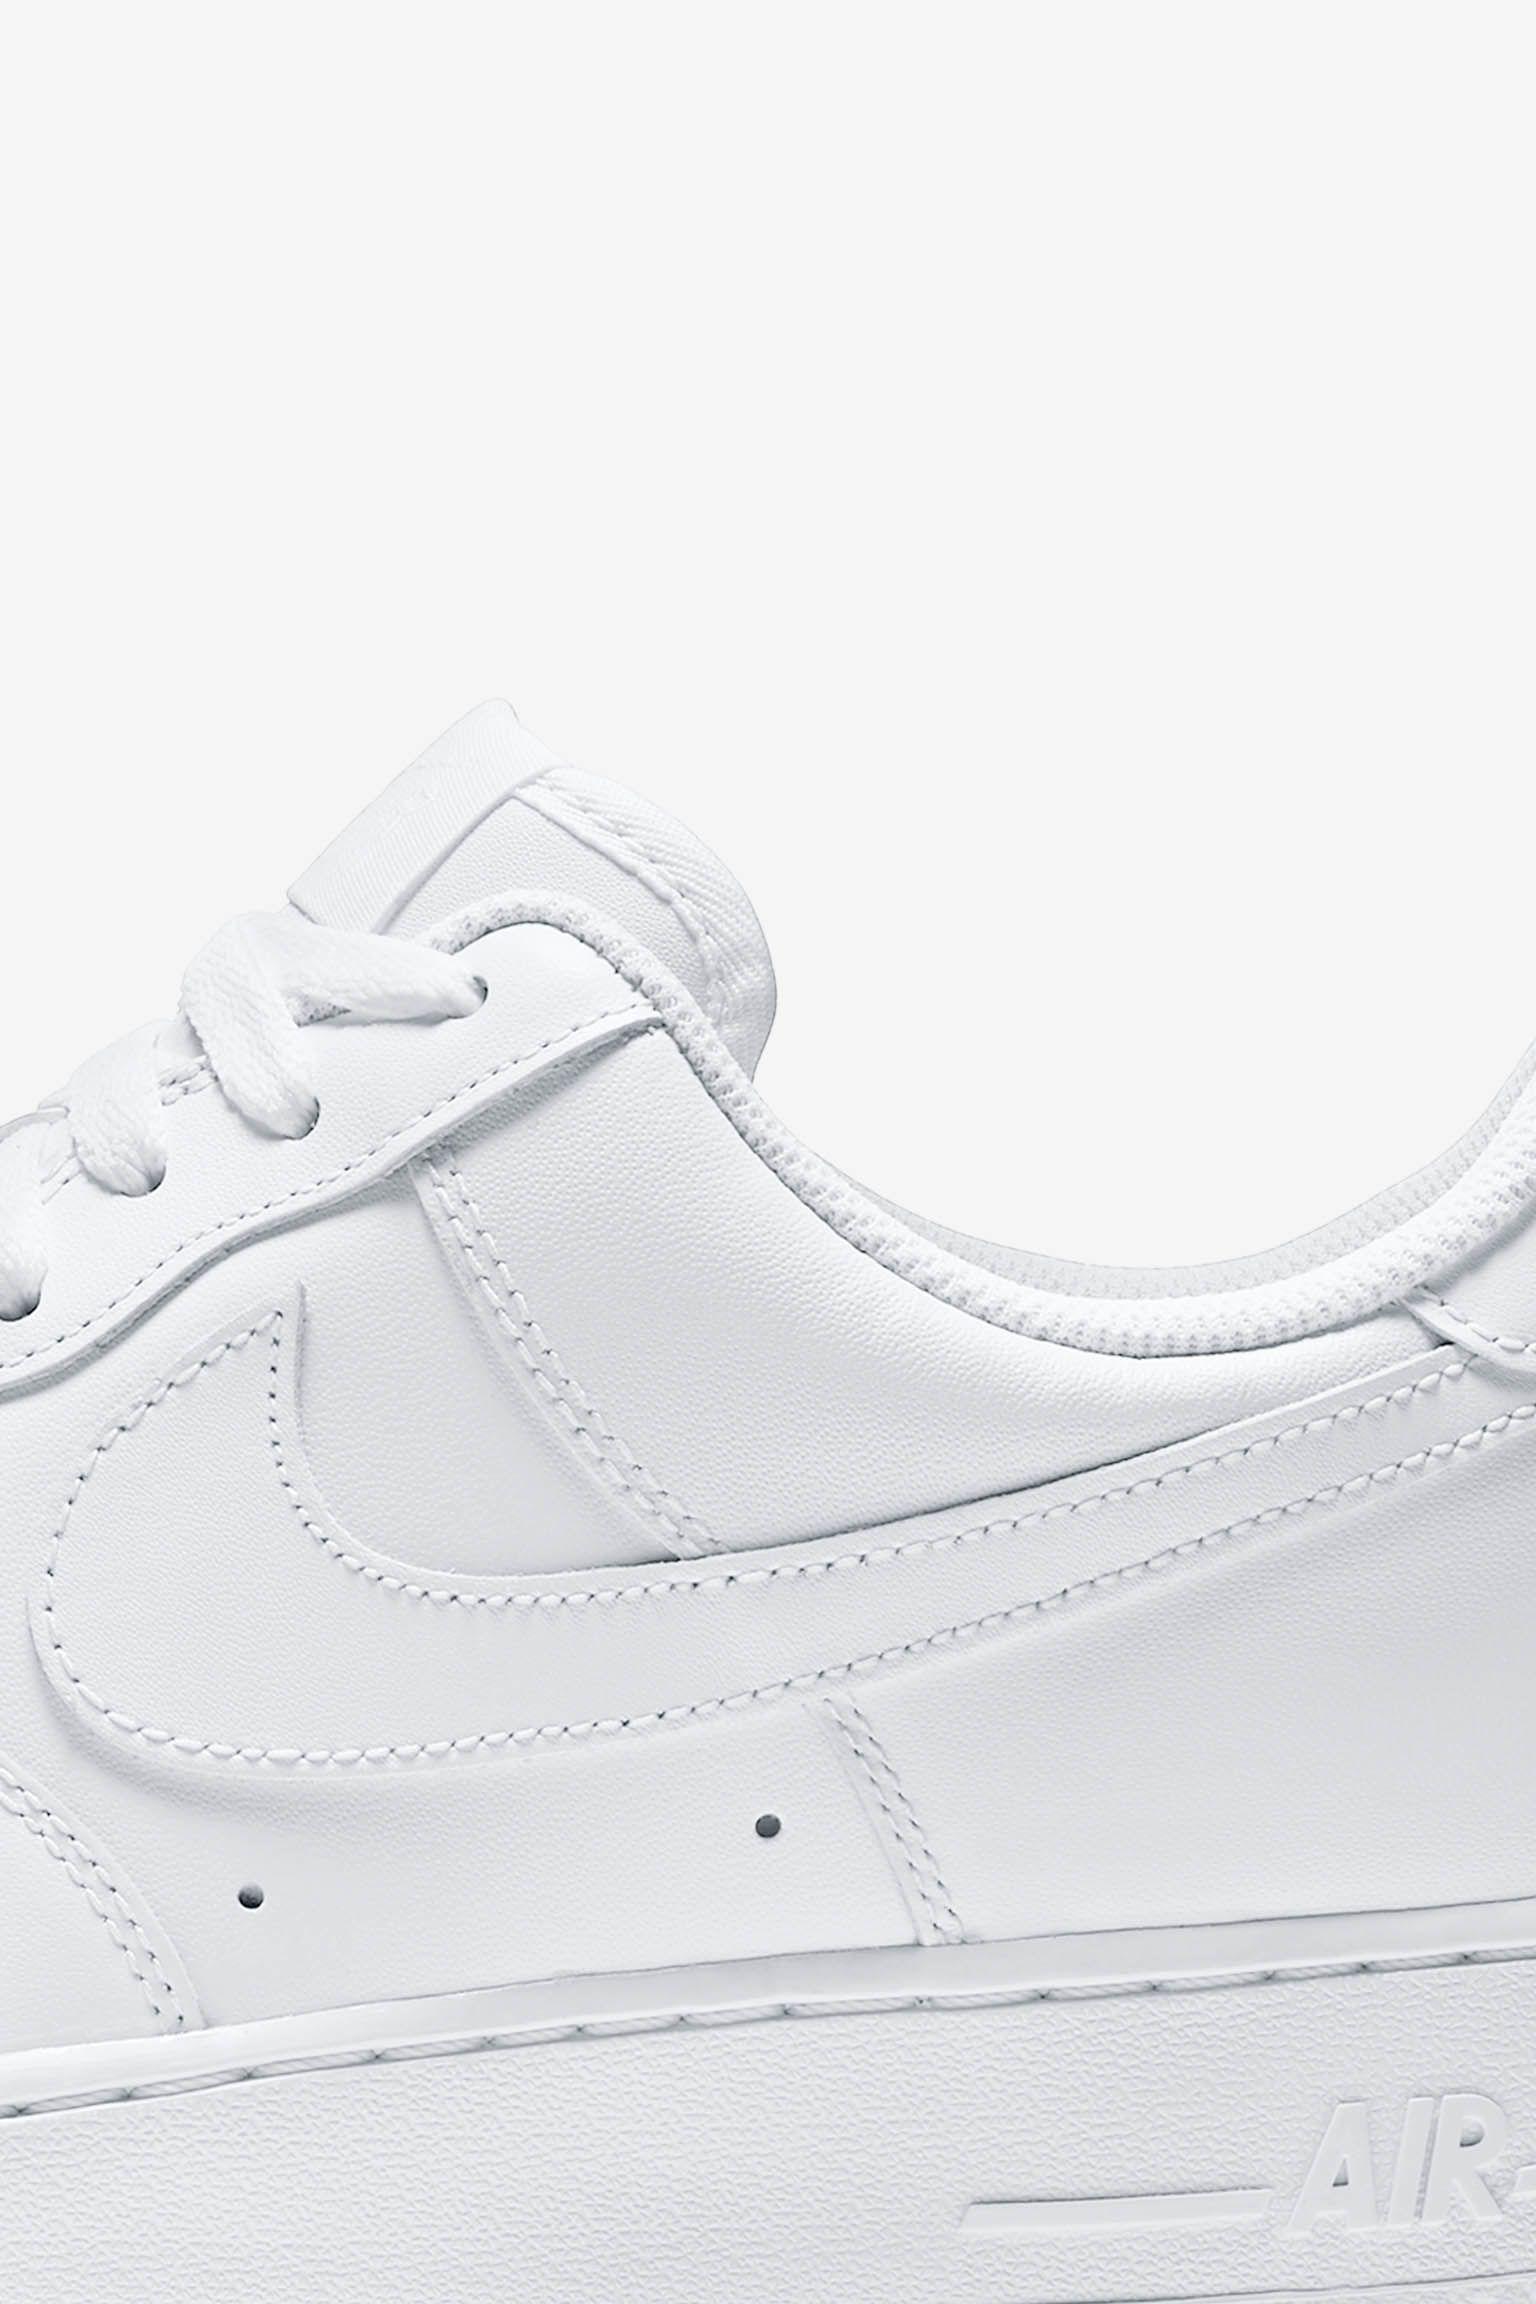 cheaper 31394 5d023 Nike Cross Brand Shoe Force 1 07  Wish List  Air force 1, Nike air force,  Shoes